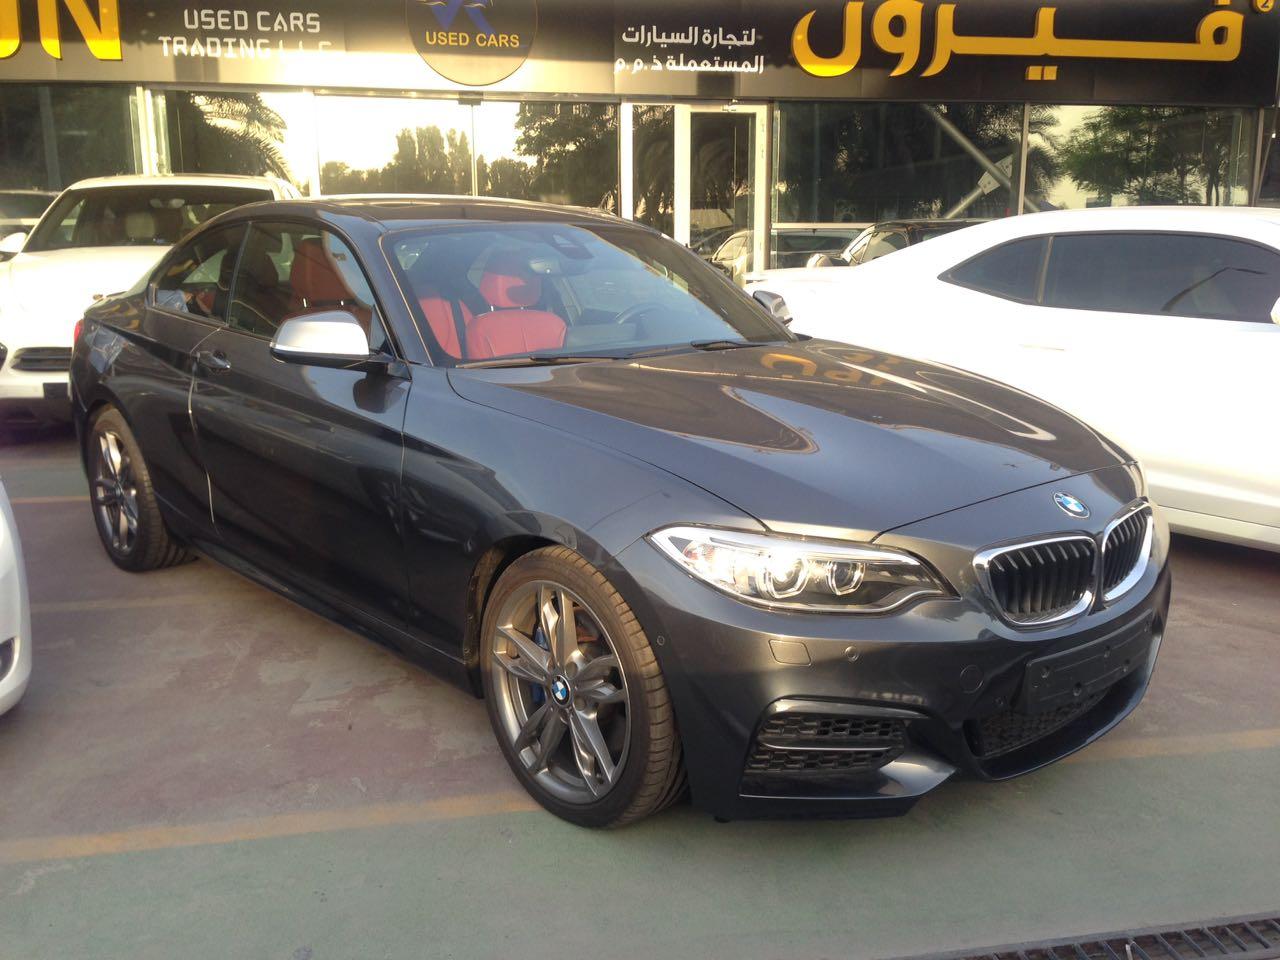 BMW M235i Coupe Prices, Gcc Spec Used car for sale | Veyron Motors Dubai